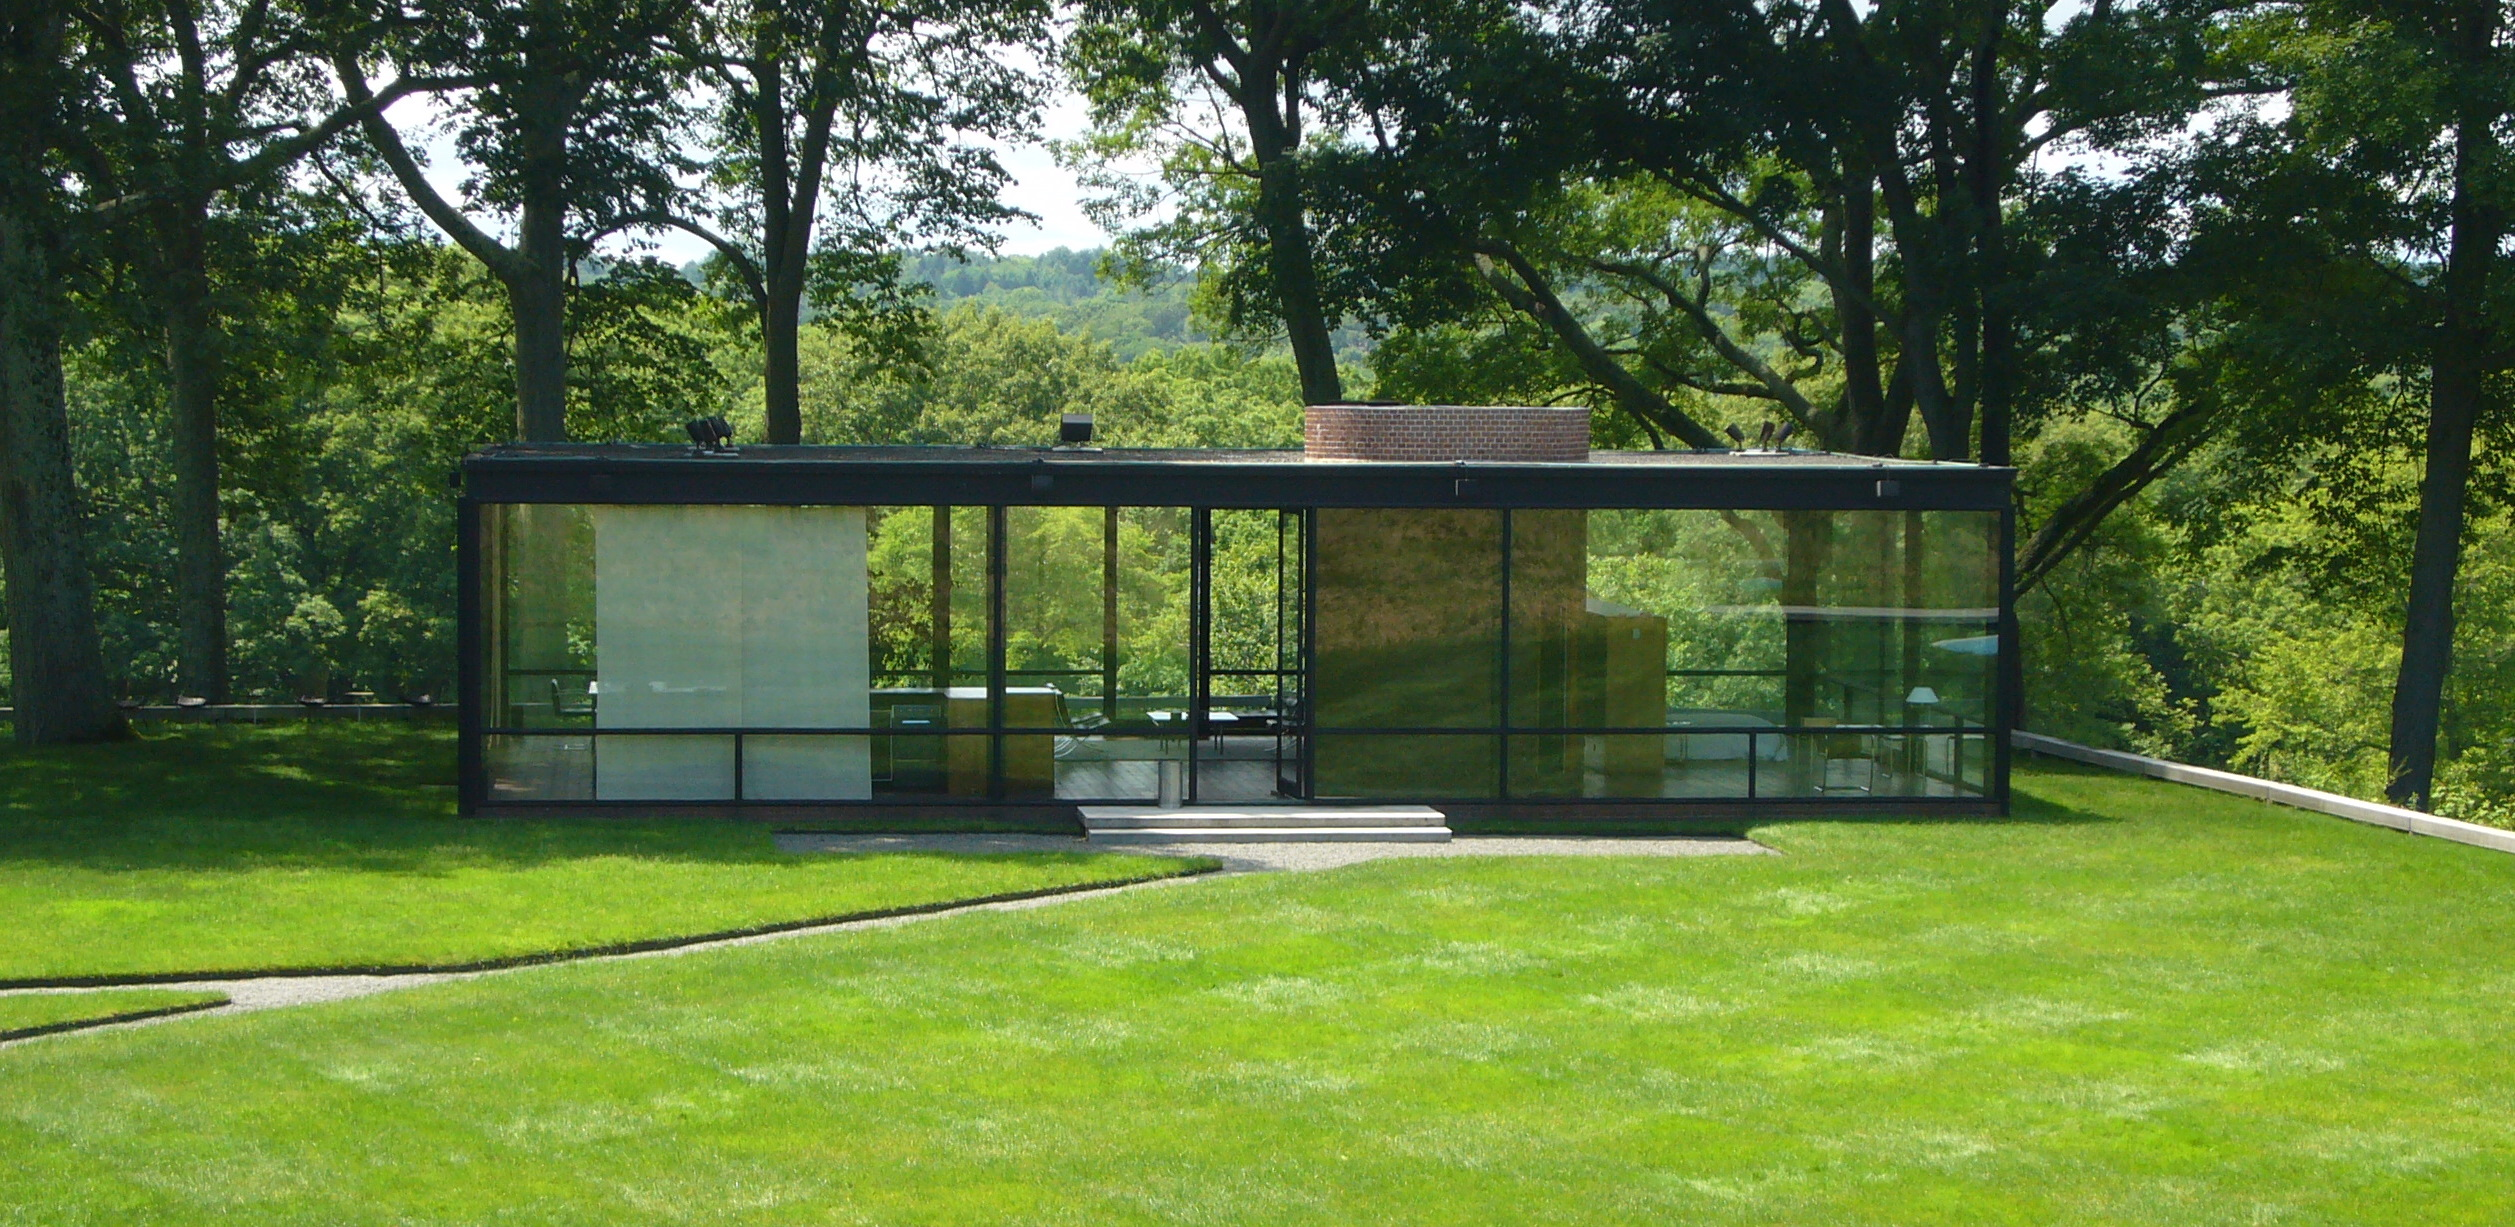 https://i1.wp.com/upload.wikimedia.org/wikipedia/commons/6/63/Glasshouse-philip-johnson.jpg